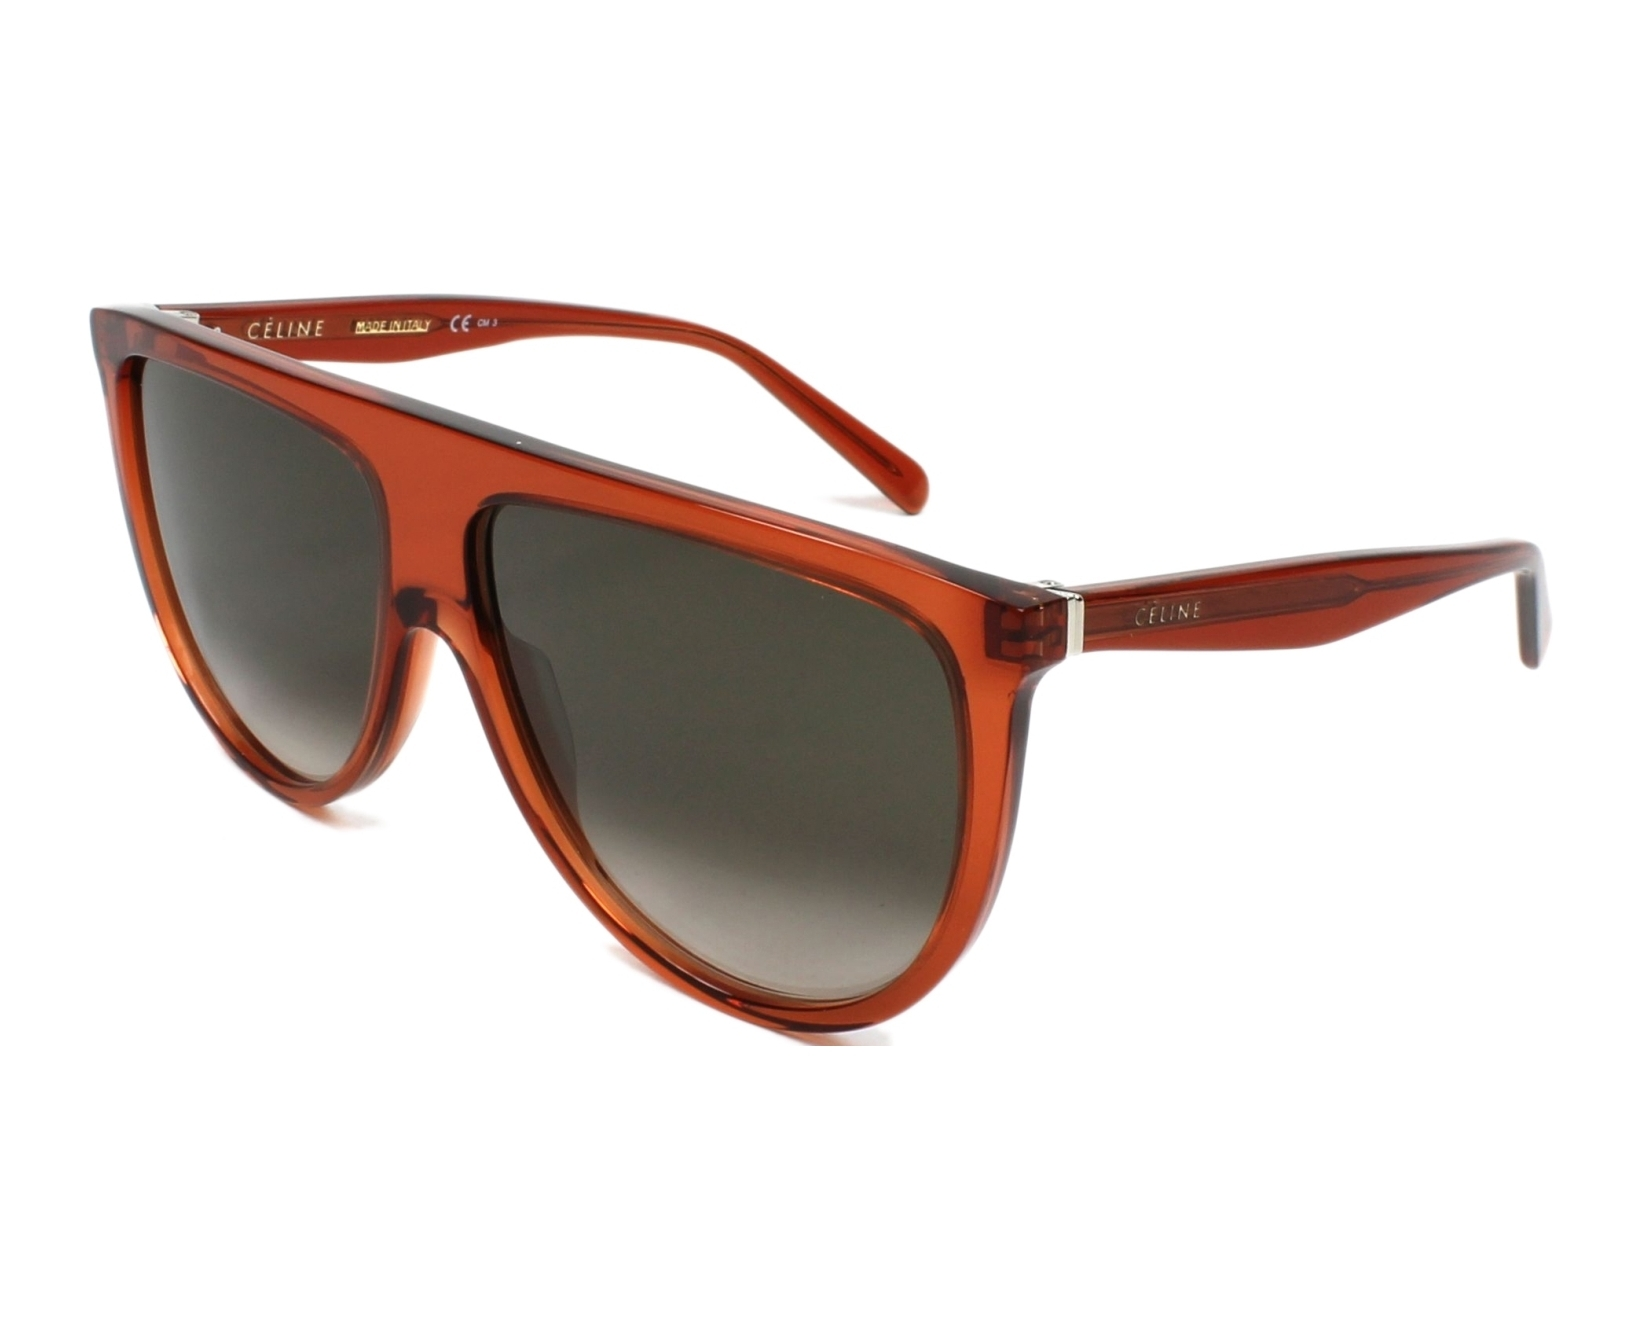 C 233 Line Sunglasses Orange With Brown Lenses Cl 41435 Efb Z3 Visionet Us